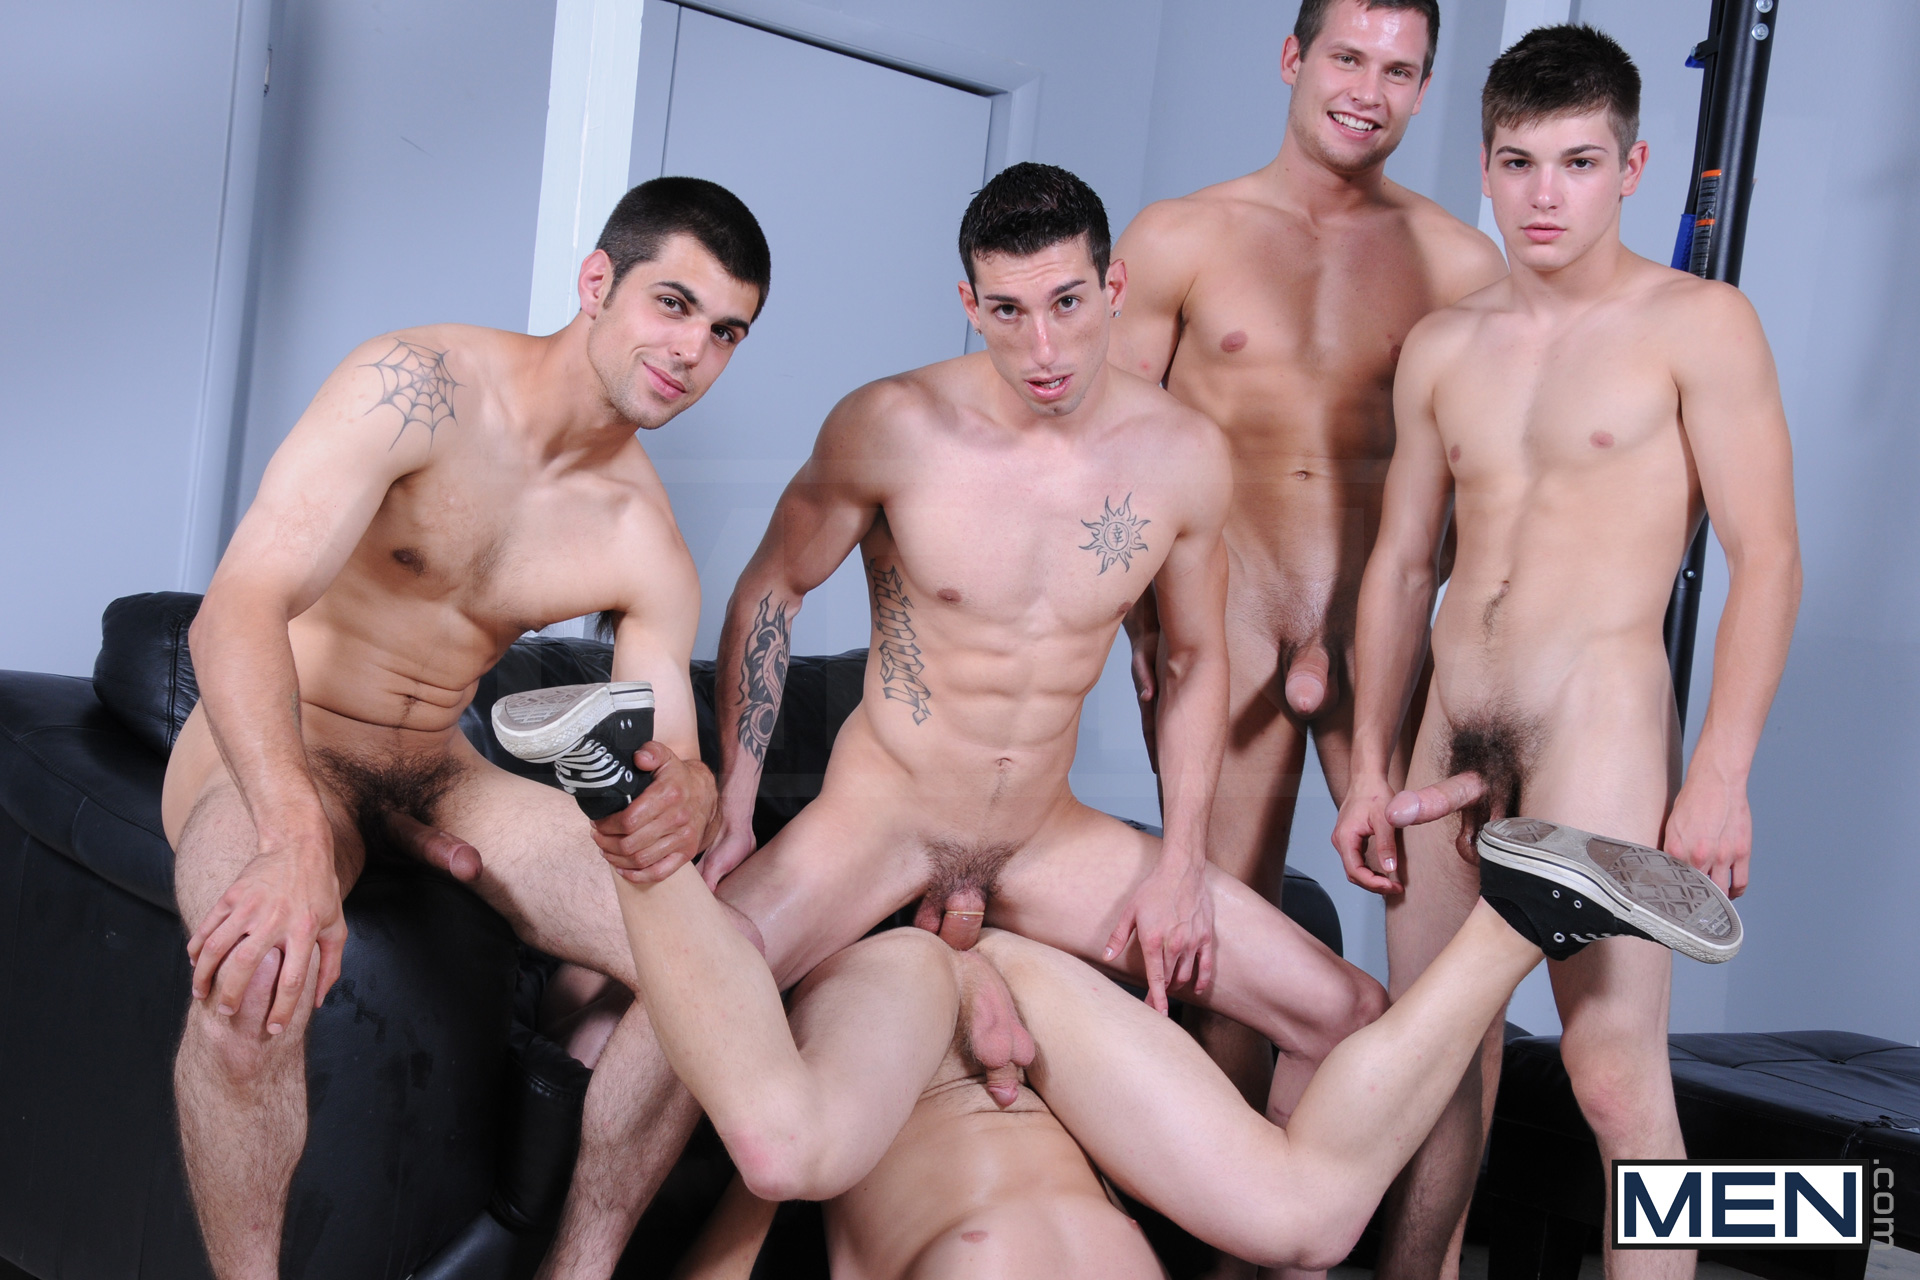 Секс ритуалы порно 24 фотография